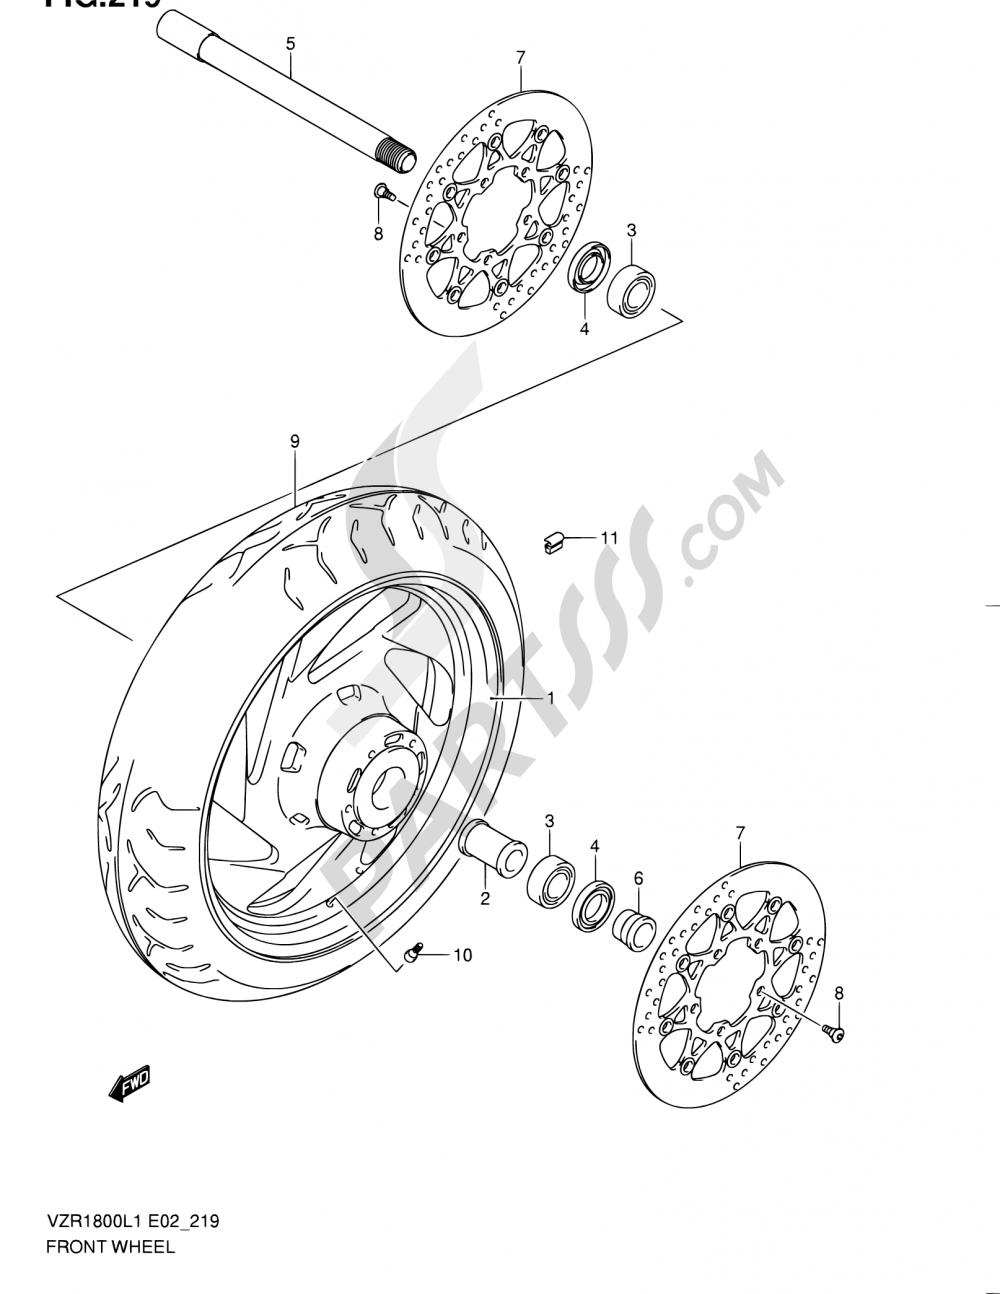 219 - FRONT WHEEL (VZR1800UFL1 E19) Suzuki VZR1800 2011